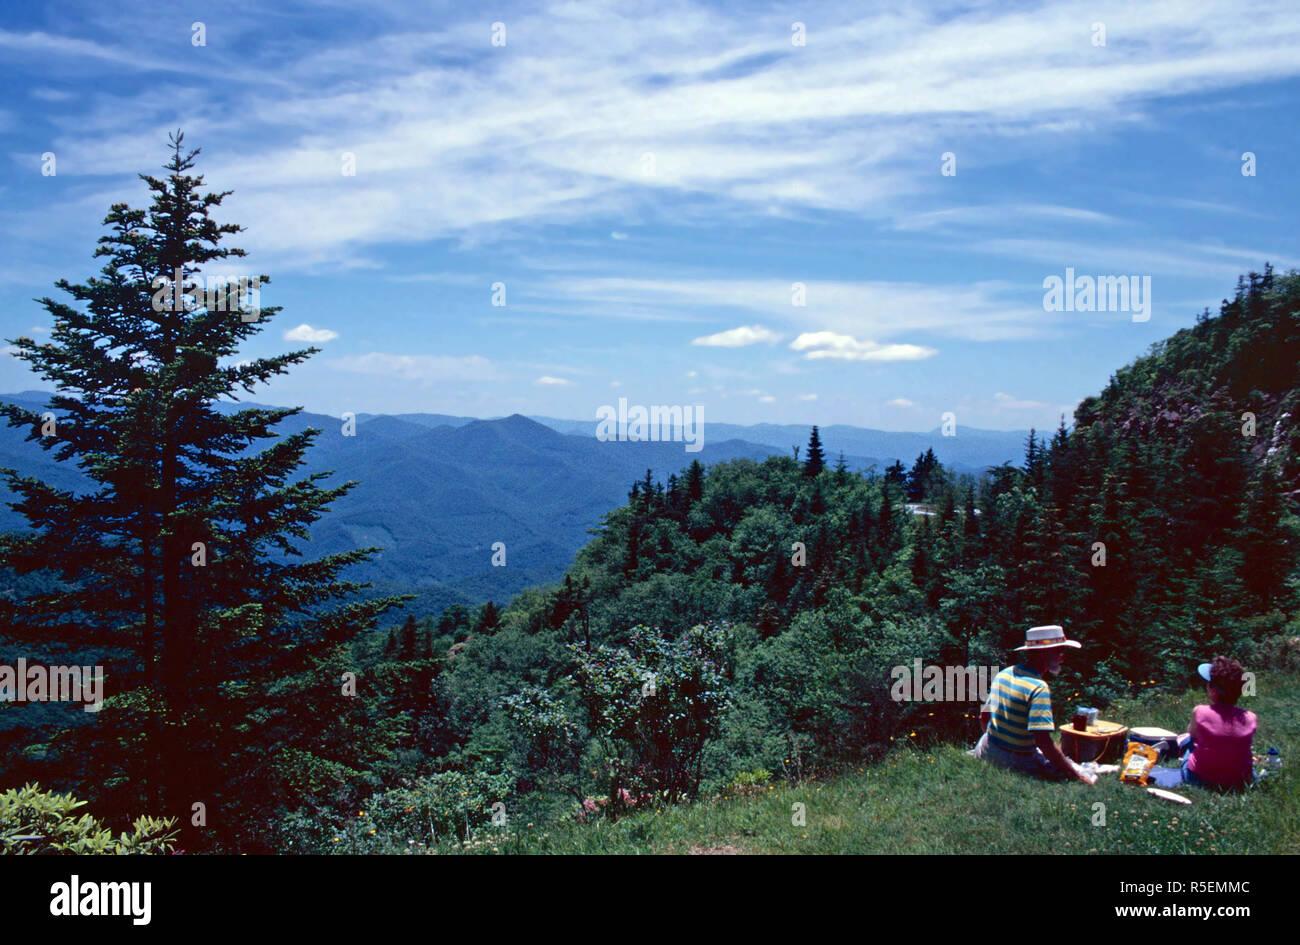 Picnicking at Waterrock Knob,Blue Ridge Parkway,North Carolina - Stock Image